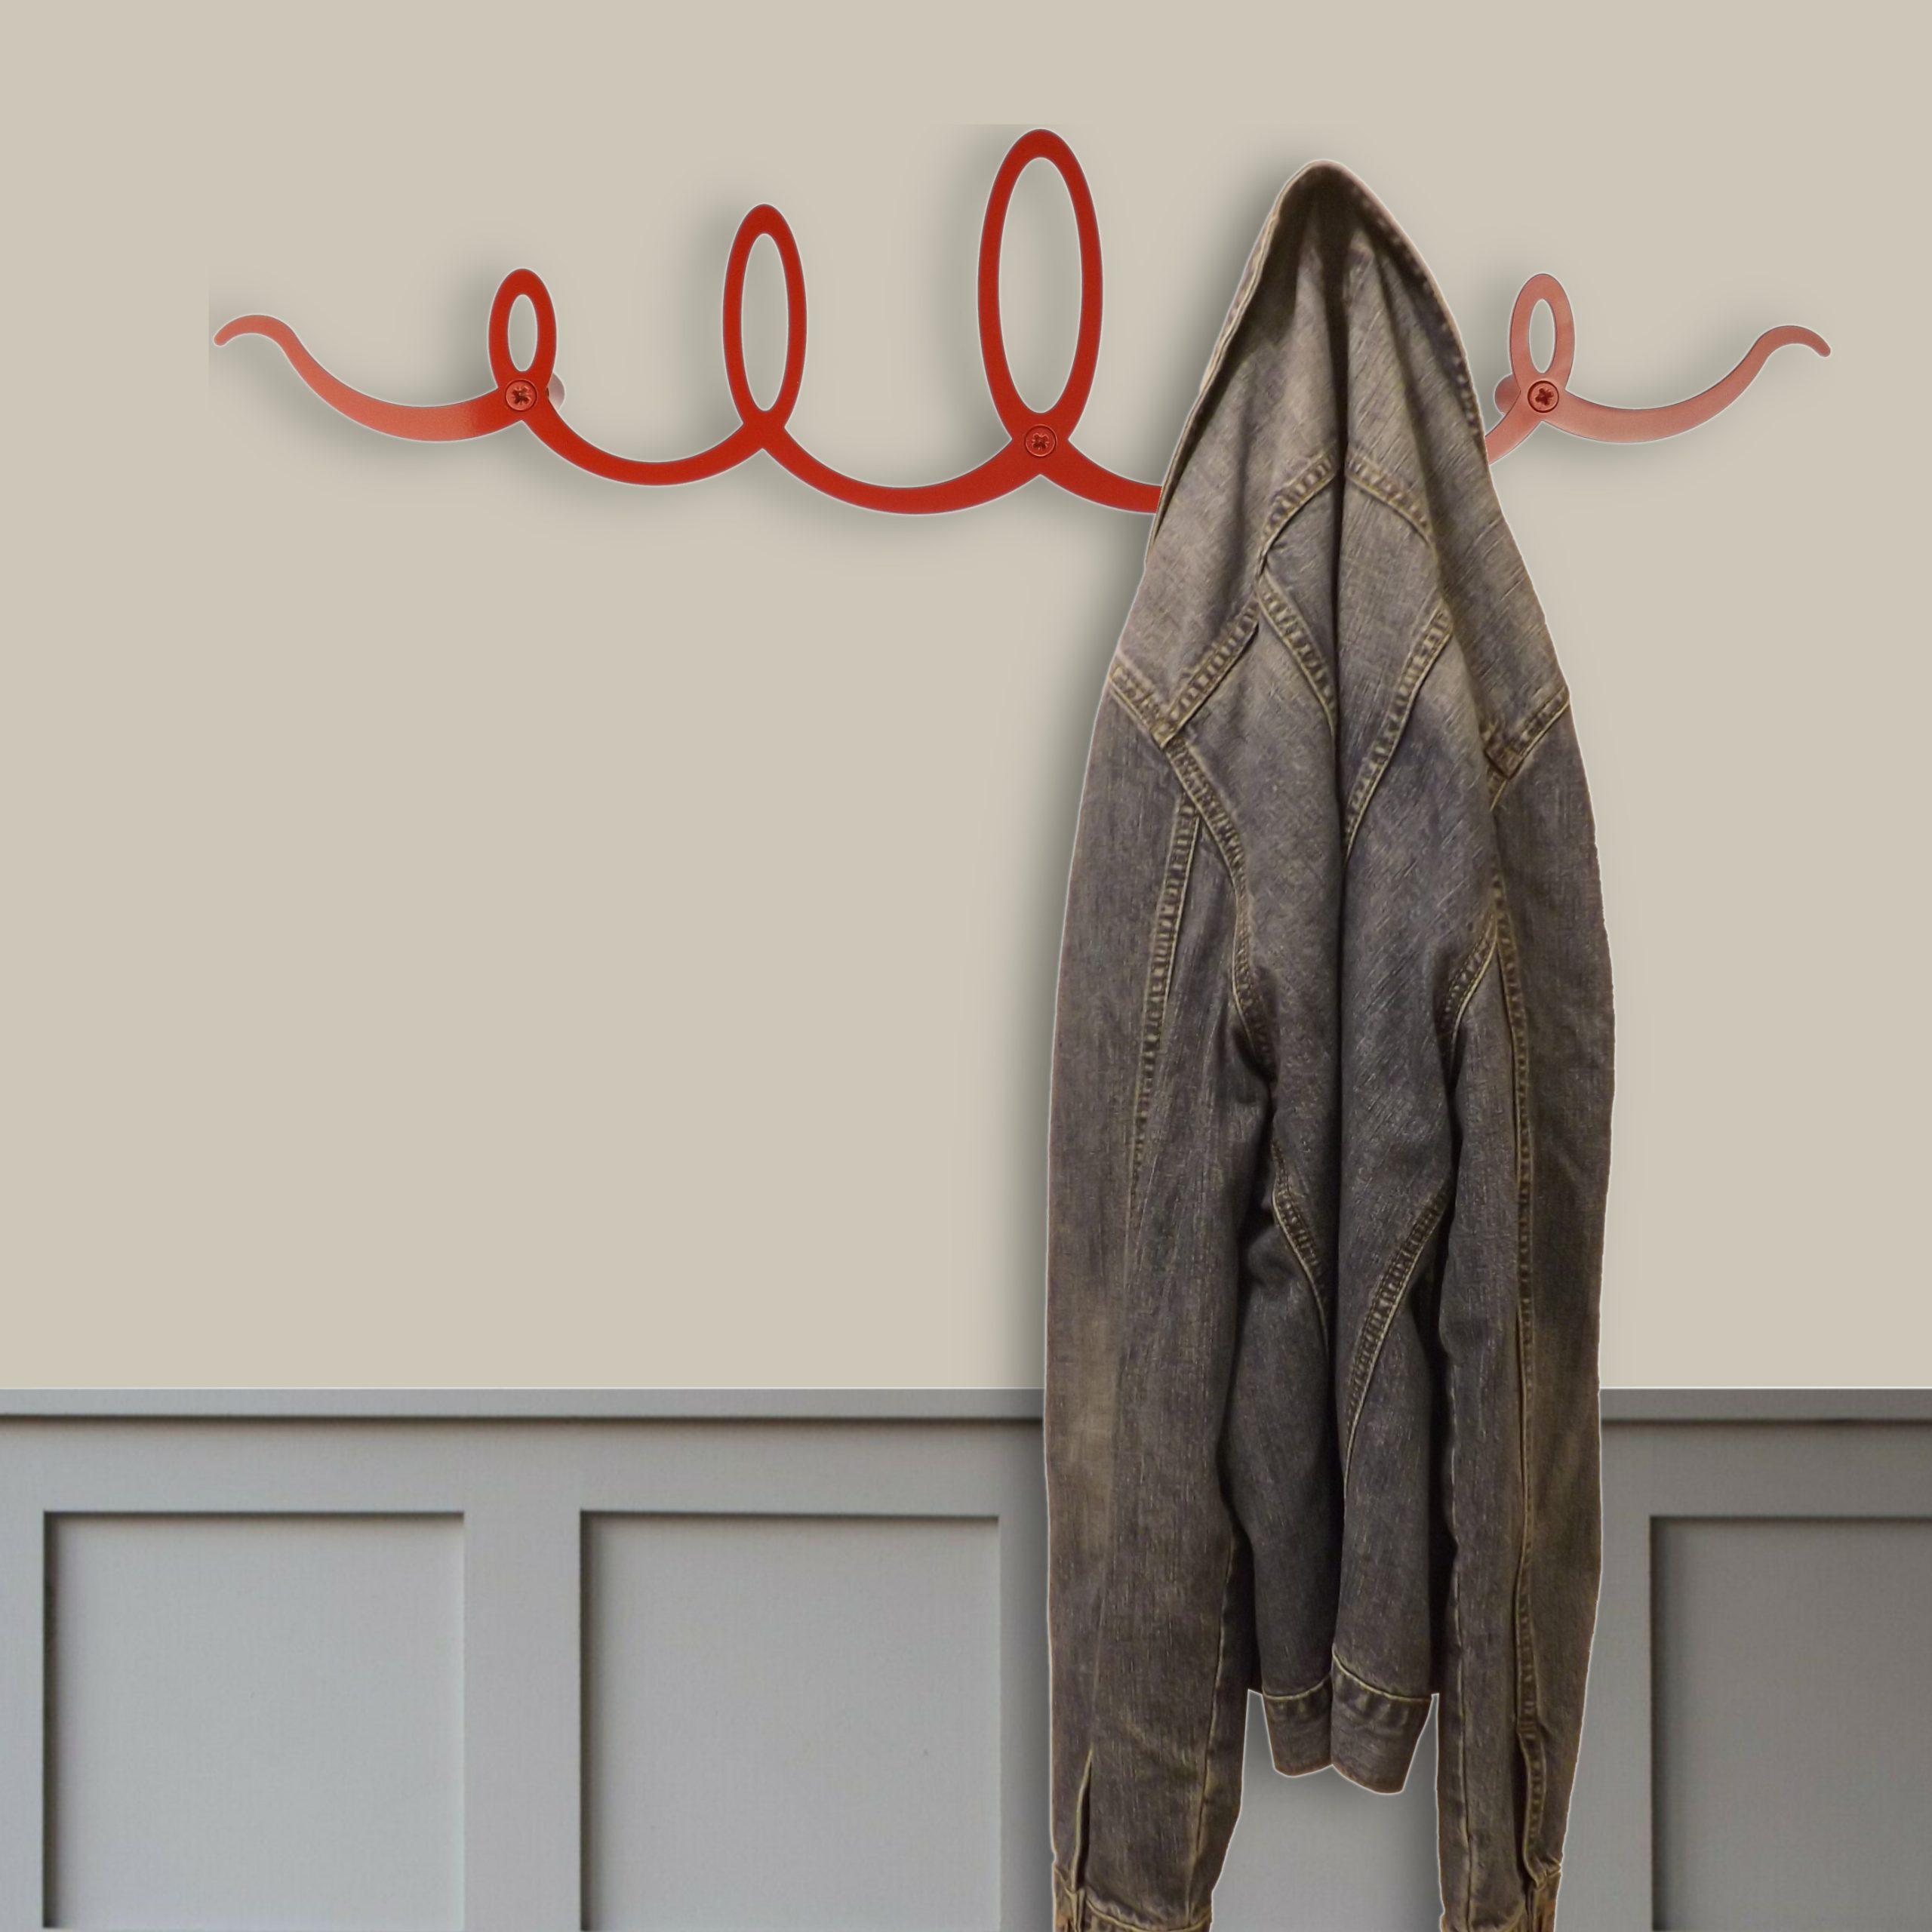 Red Squiggle Coat Rack